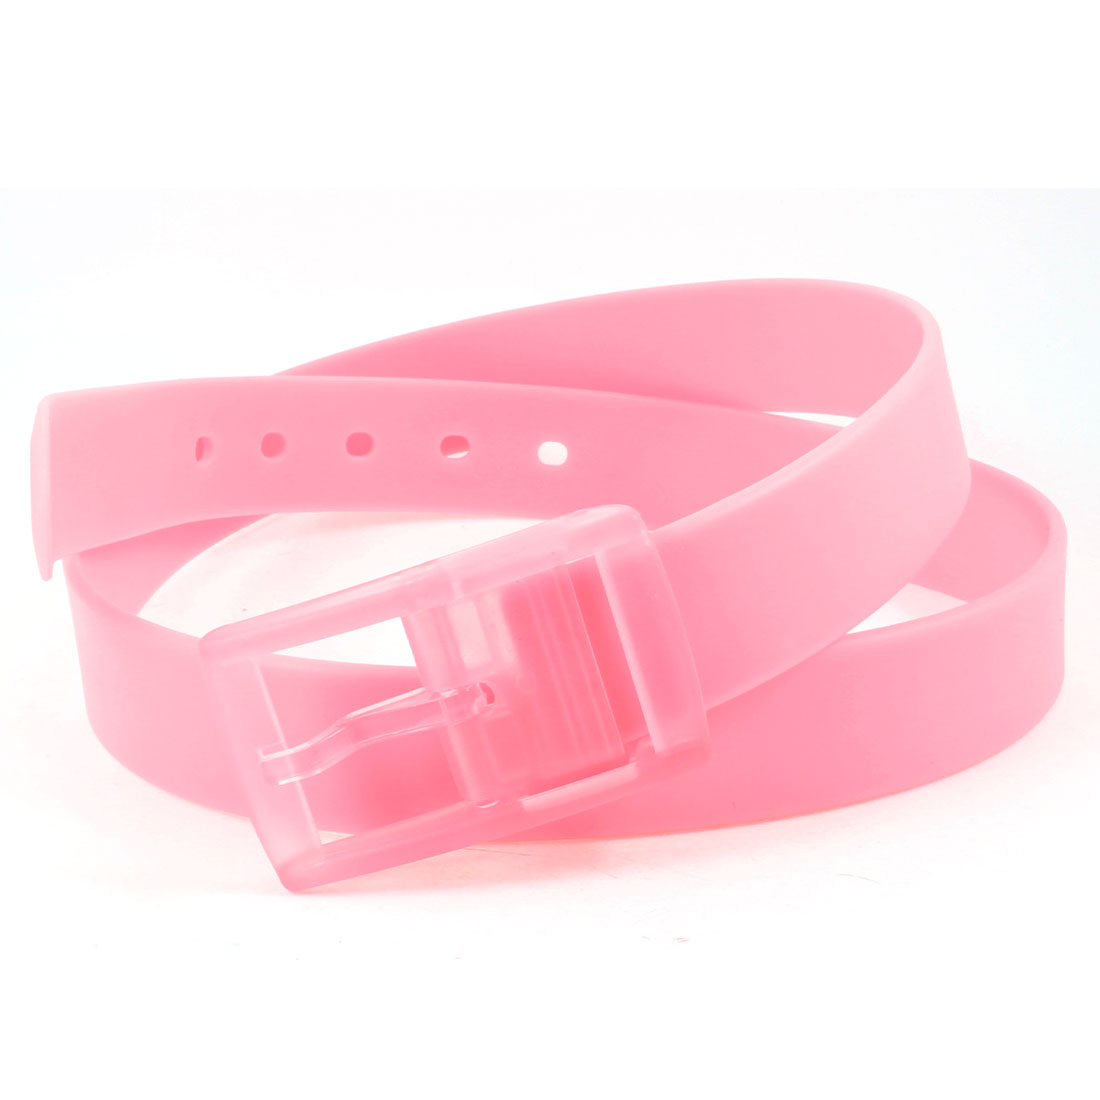 Unisex Plastic Rectangle Buckle 3cm Wide Perforated Fragrant Waist Belt Pink